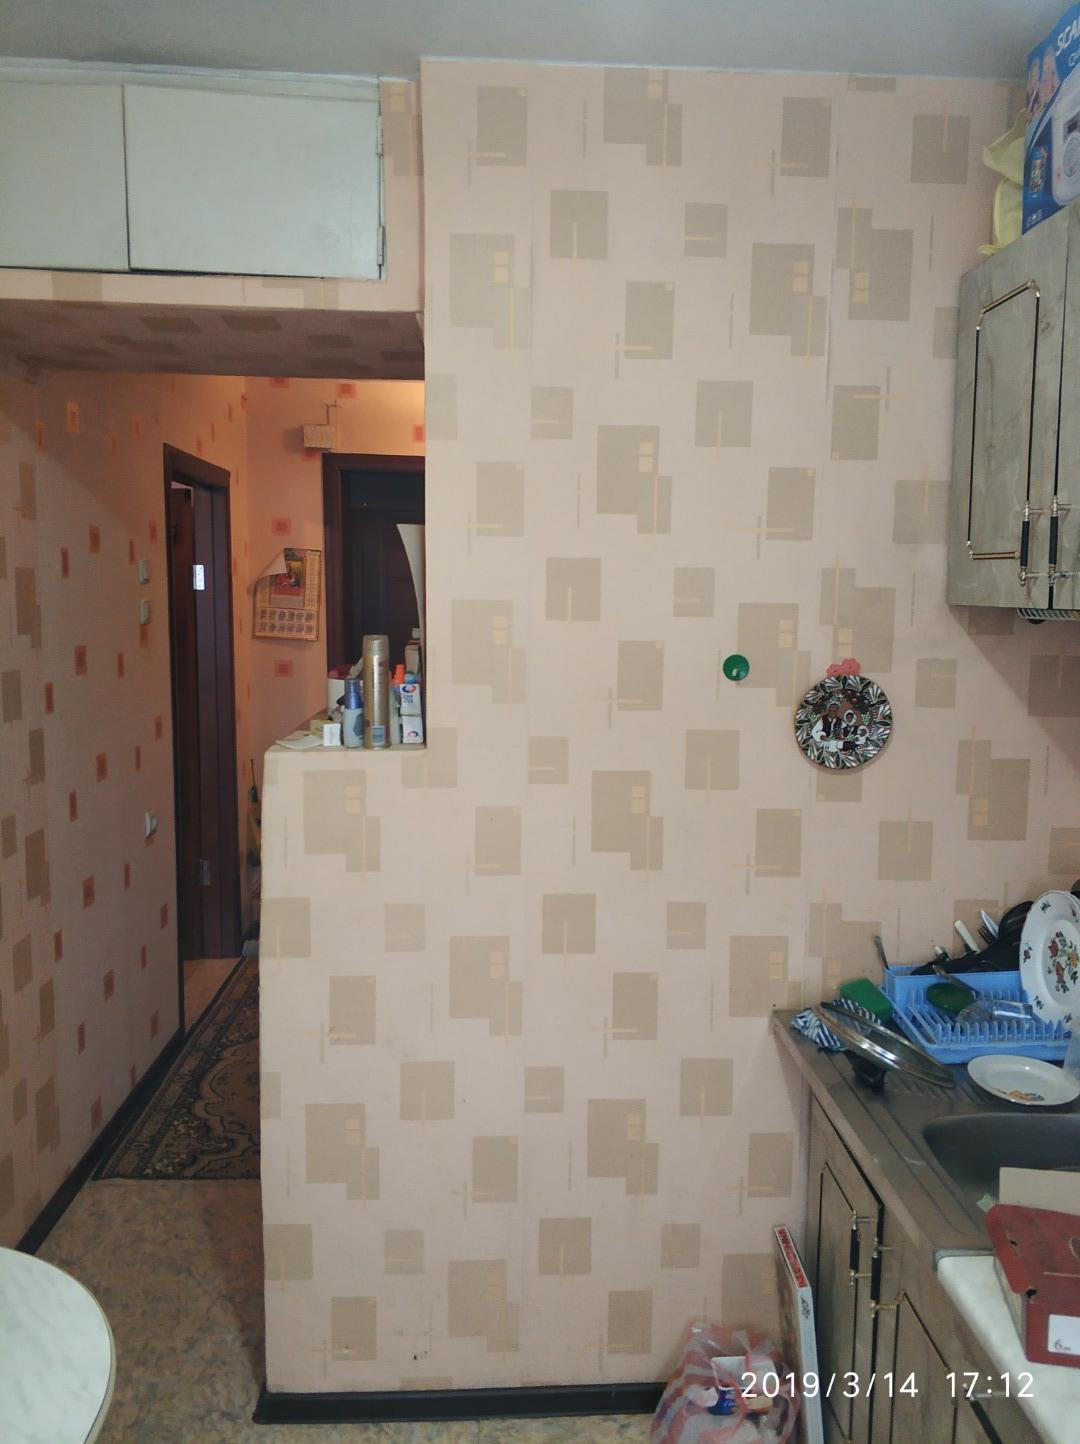 http://mielsever.3an.ru/files/IMG_20190314_171214.jpg